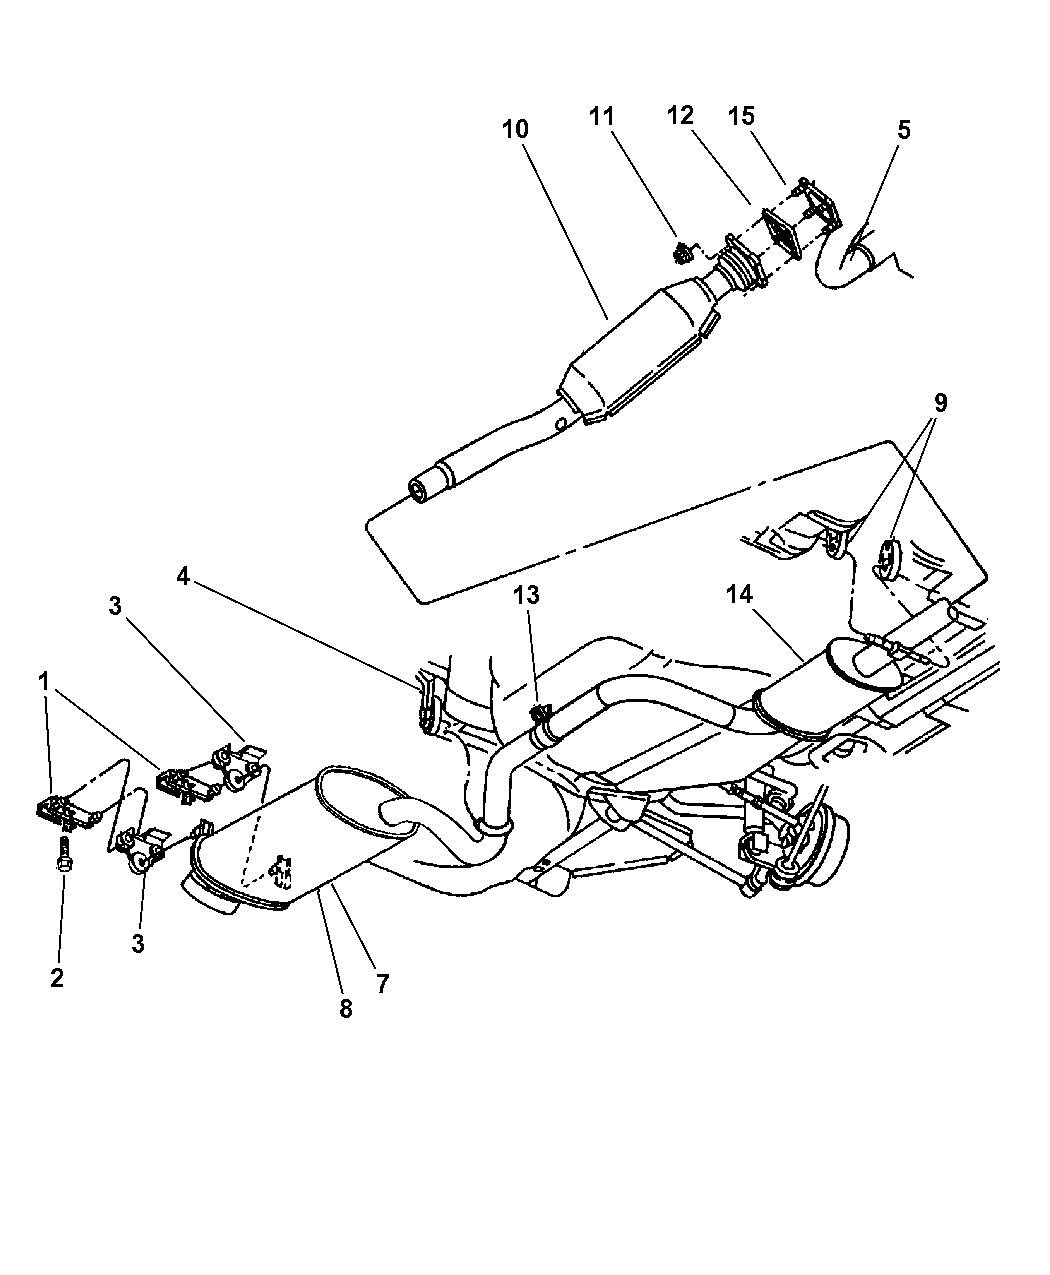 1998 Chrysler Sebring Convertible Exhaust System